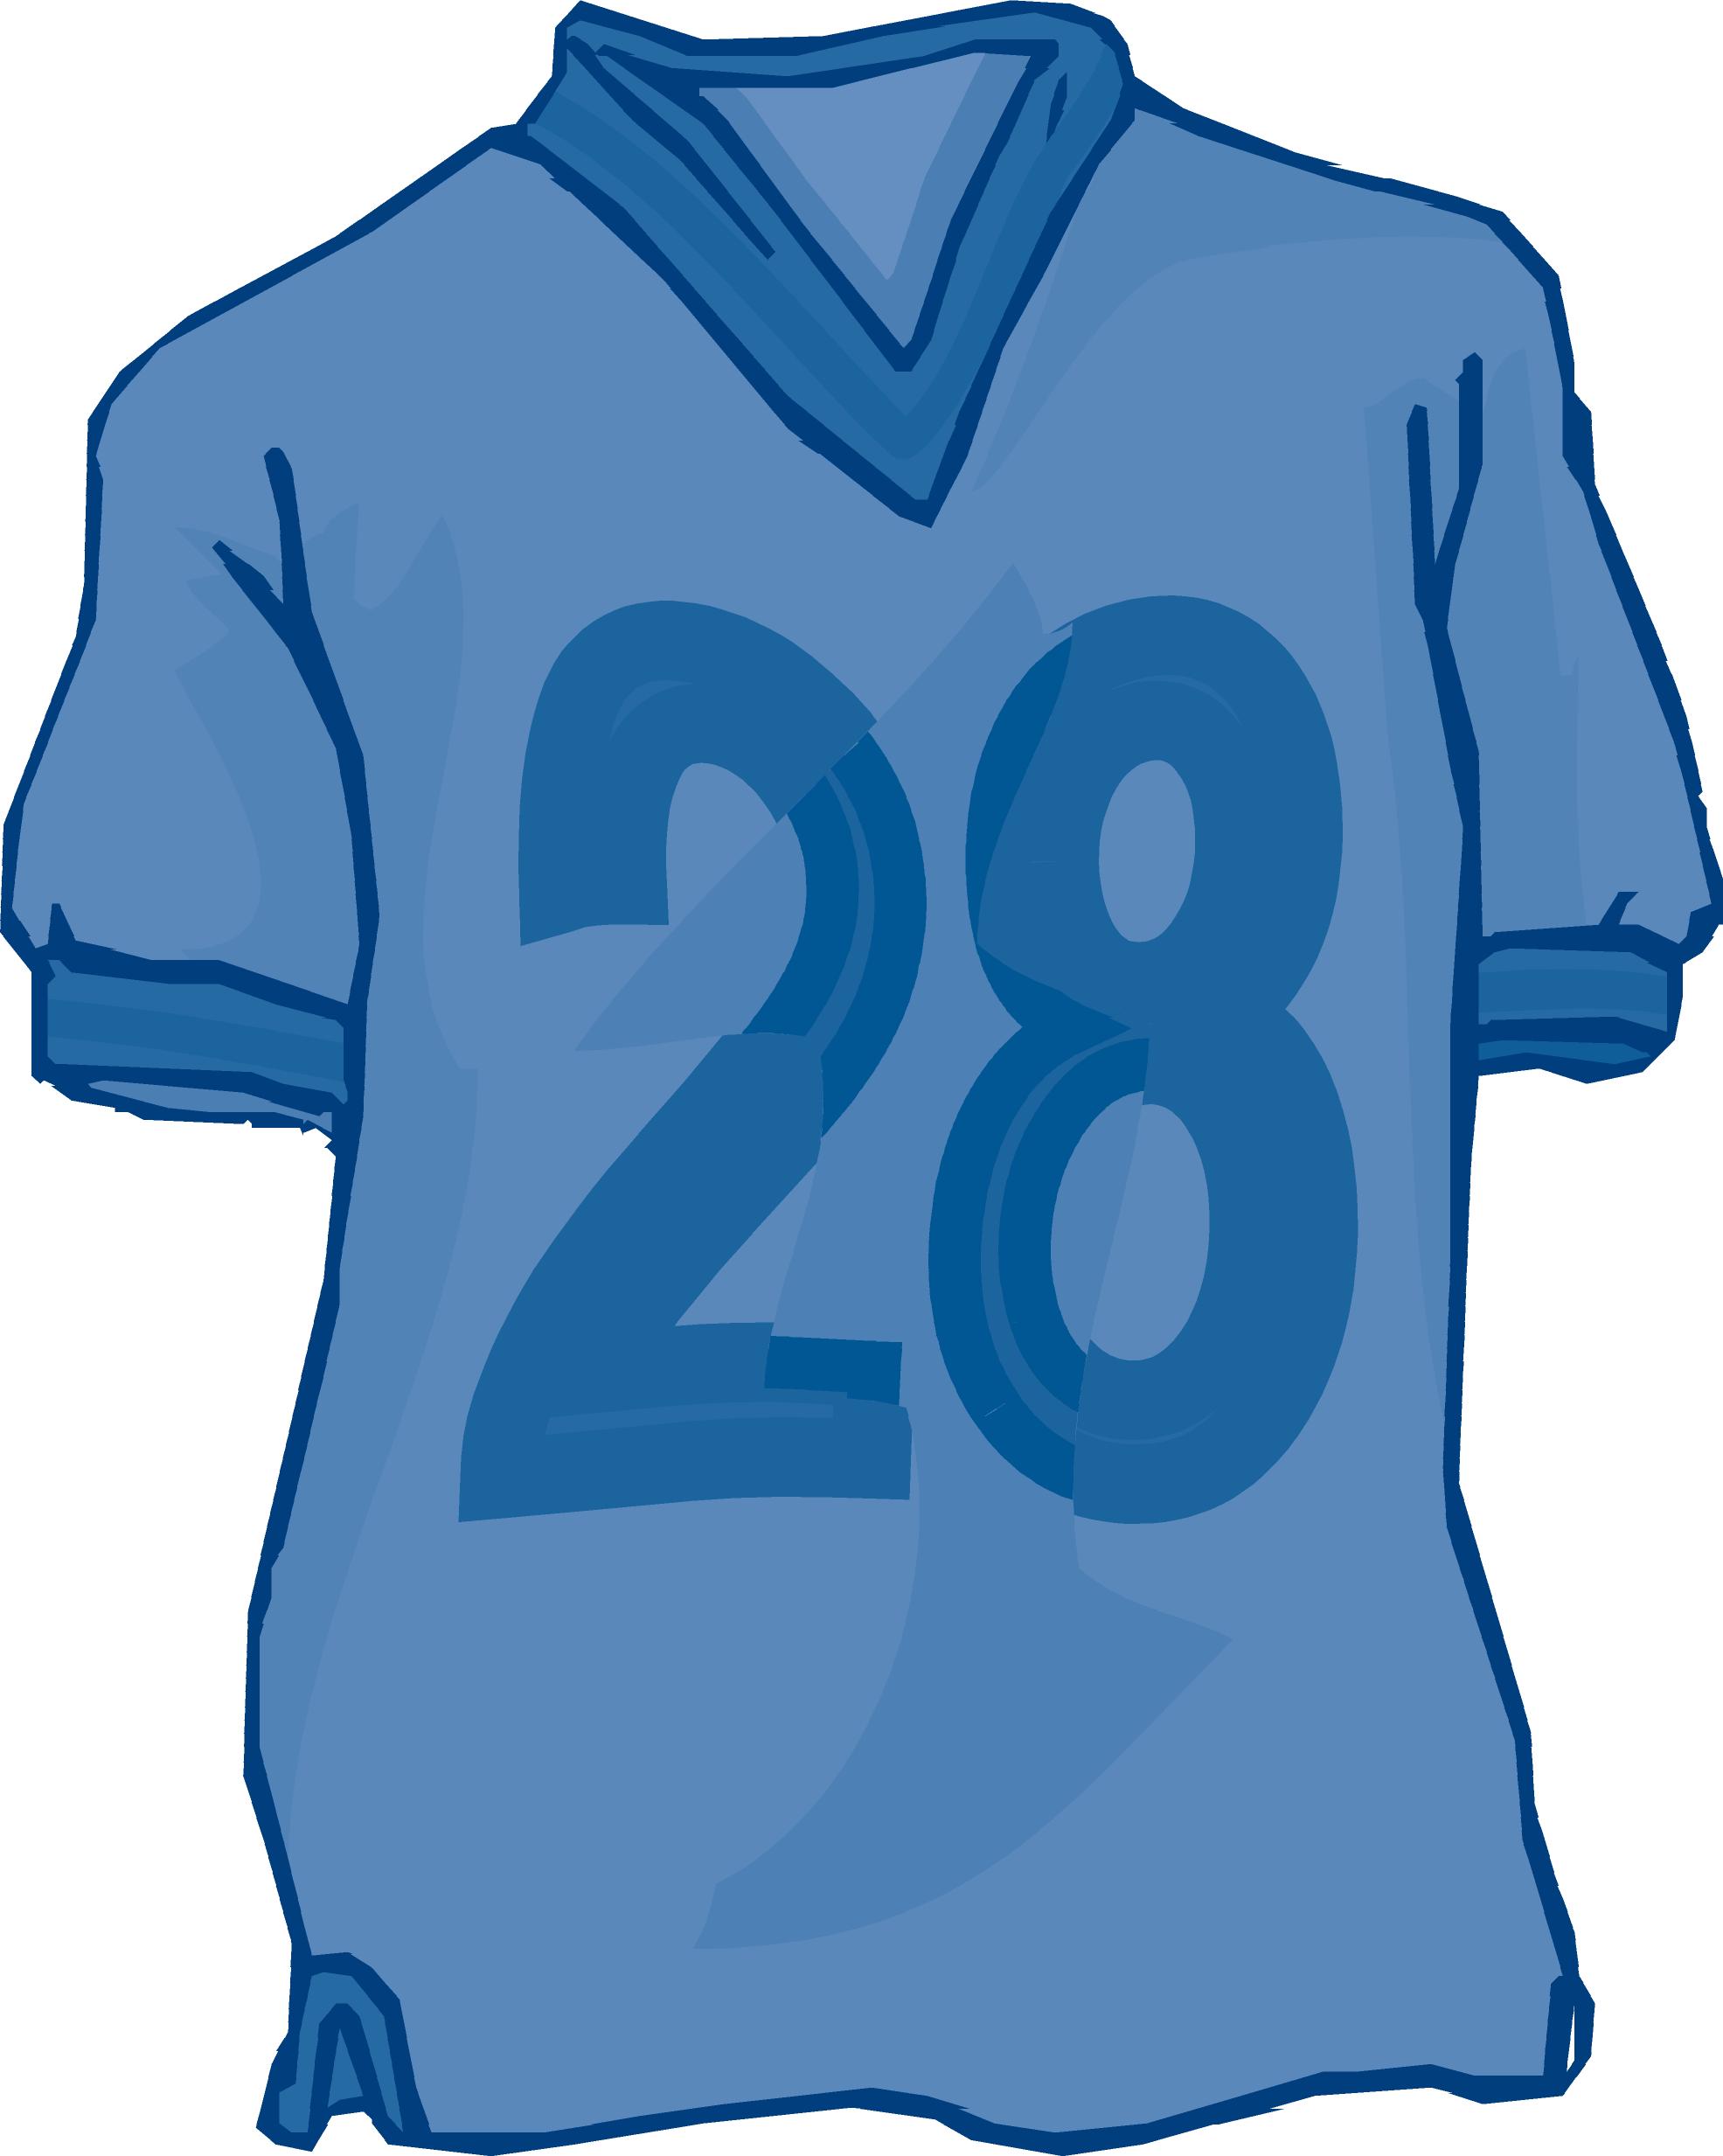 Football Jersey Clip Art Free free image.